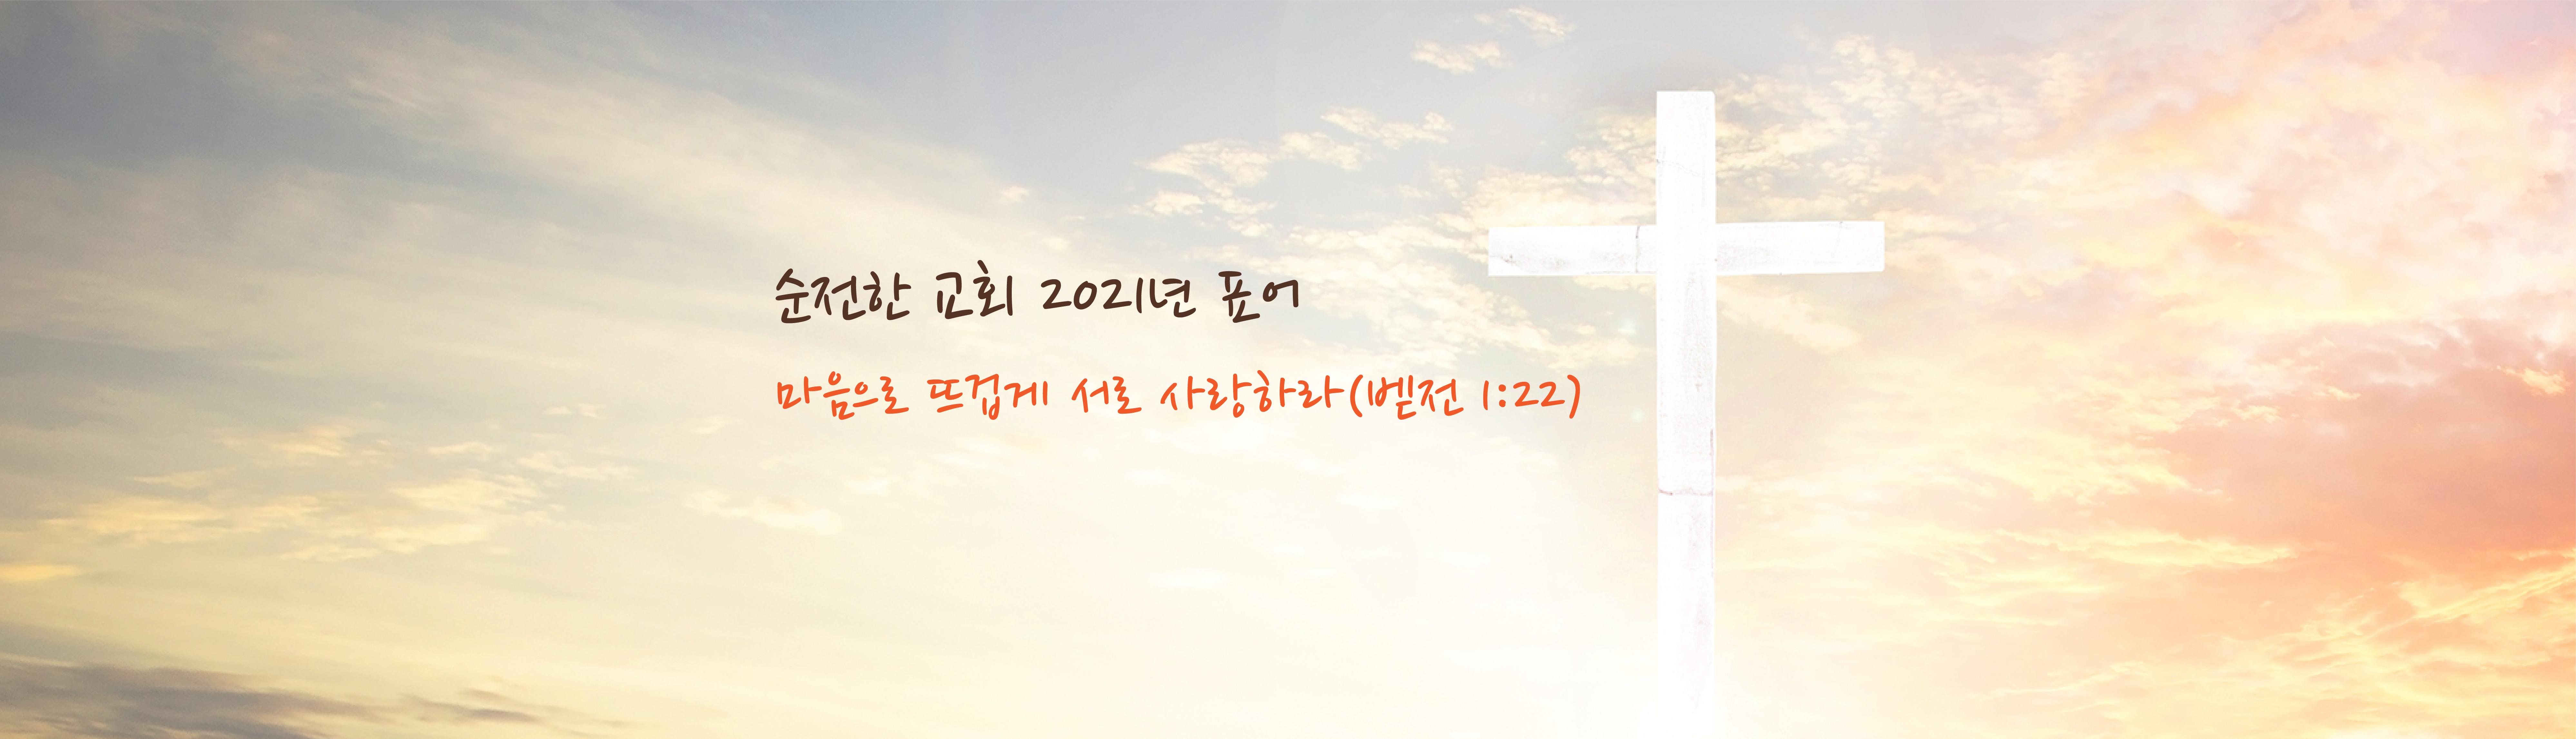 PEC_Web_MainBanner_2021-02